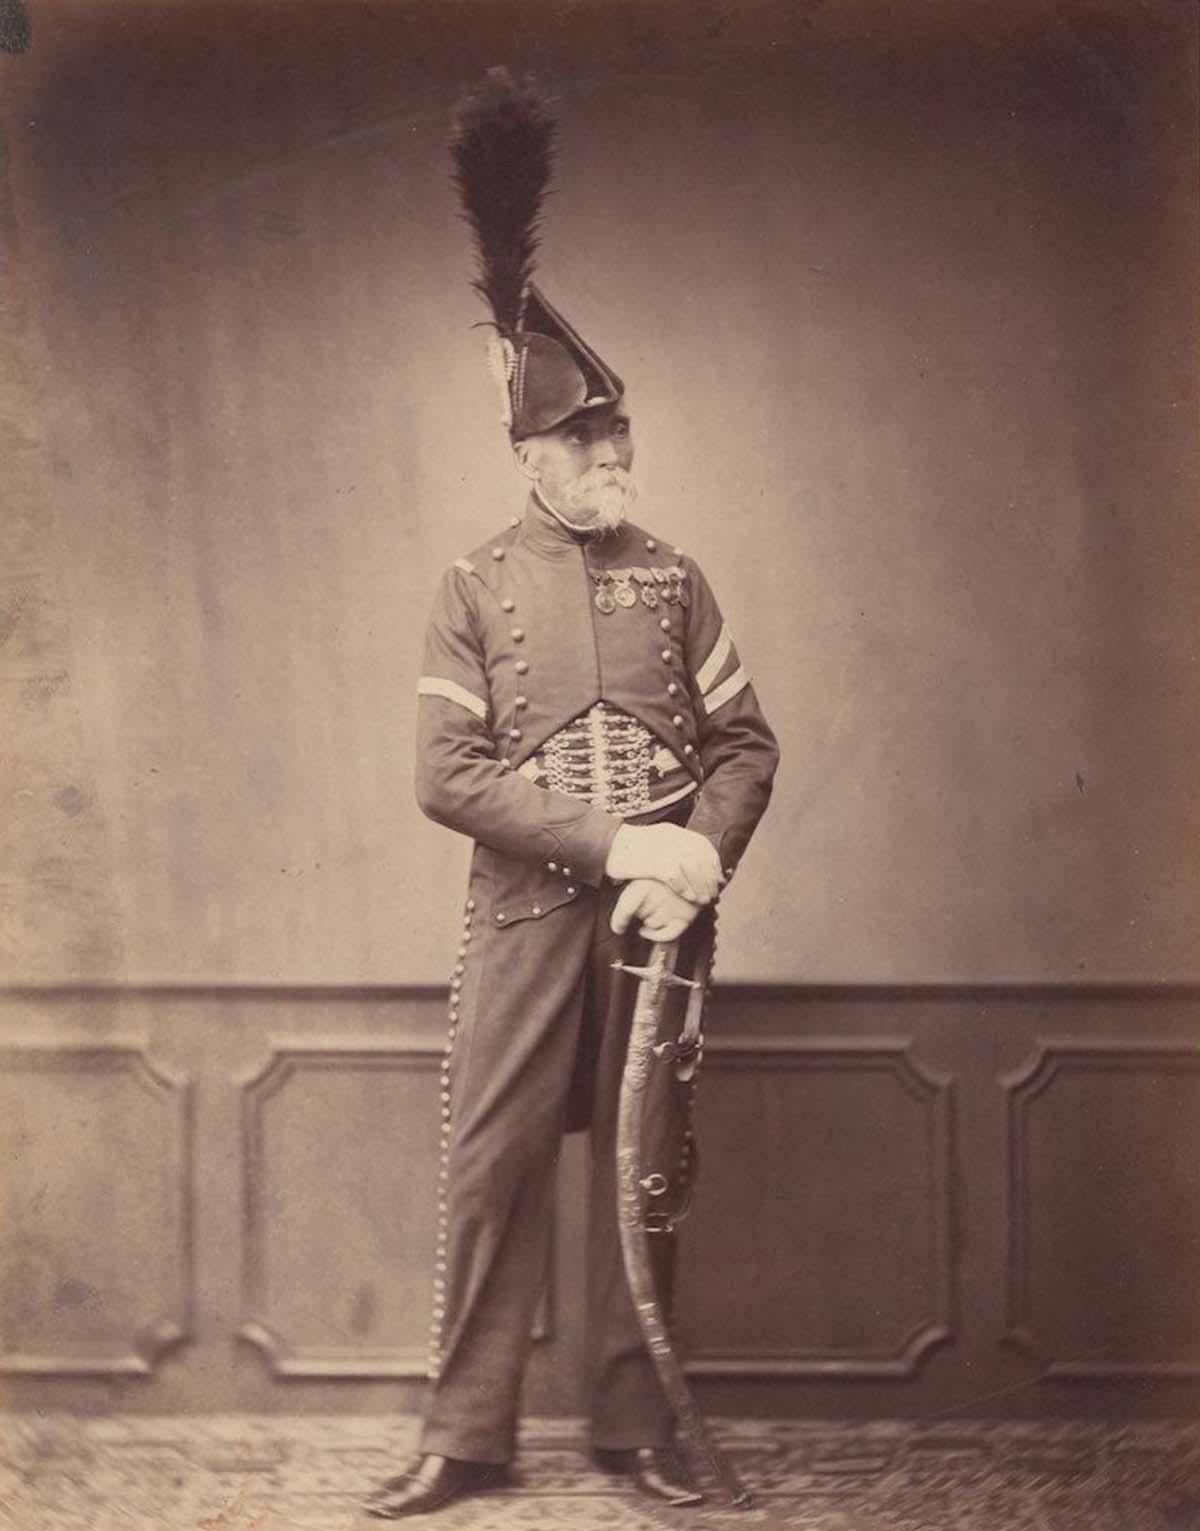 Monsieur Dupont que fue fourier para el 1er Hussar.